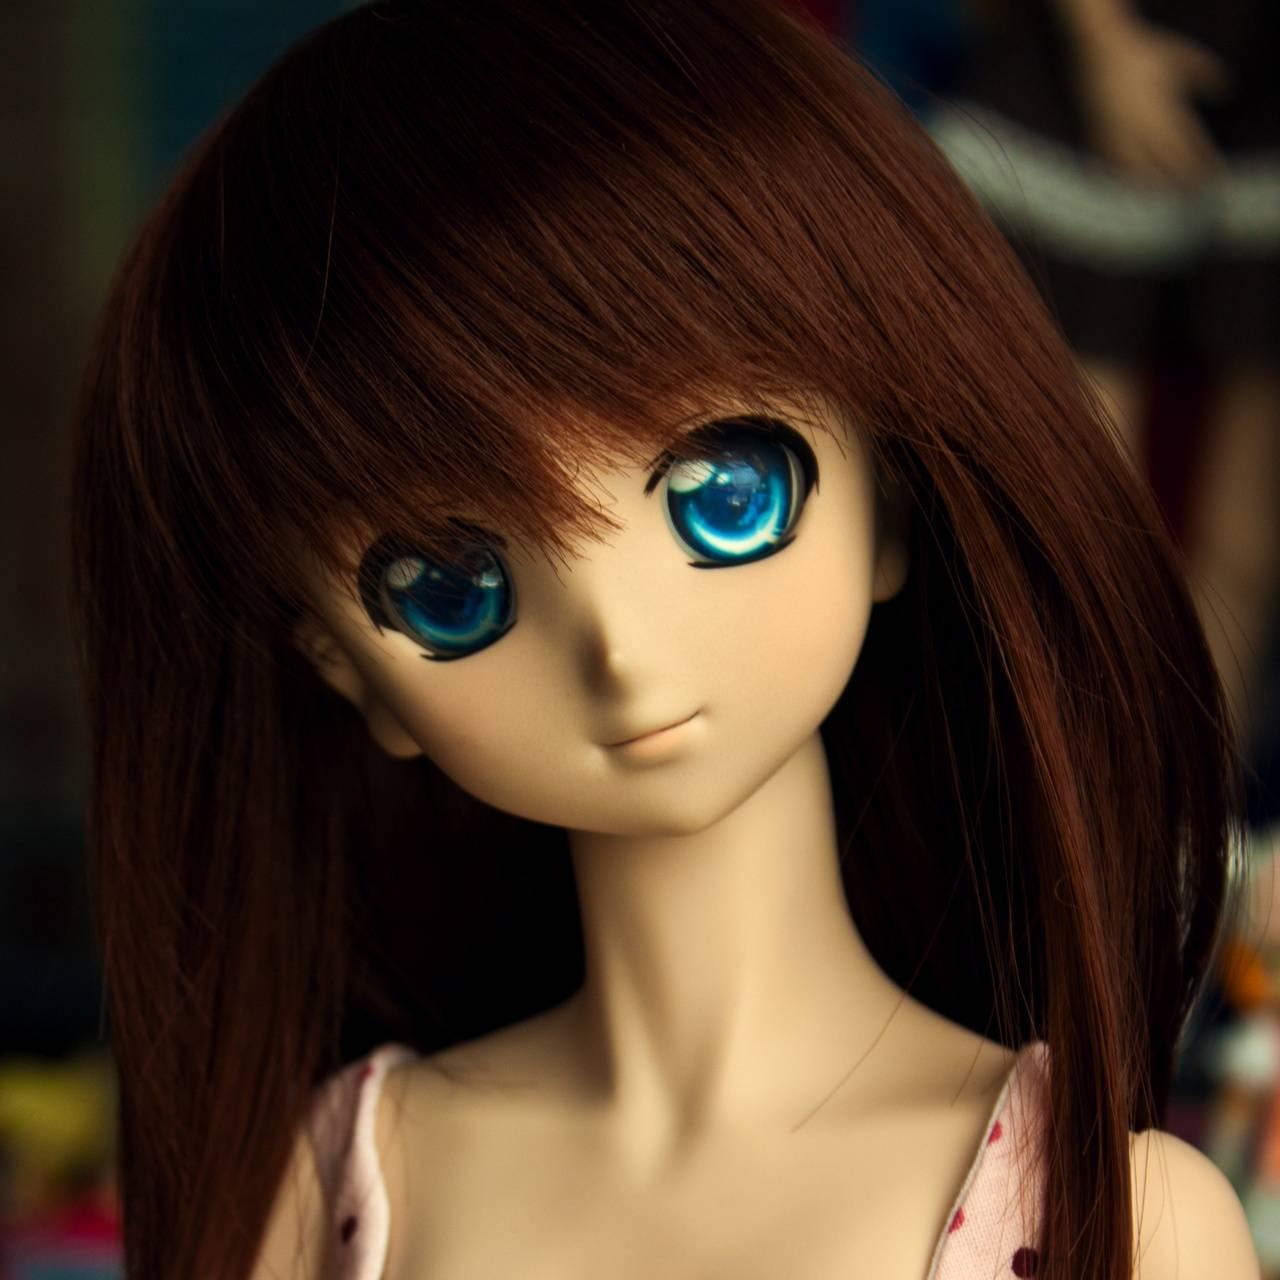 Cute Barbie Doll Hd Wallpaper By Aksruch F4 Free On Zedge